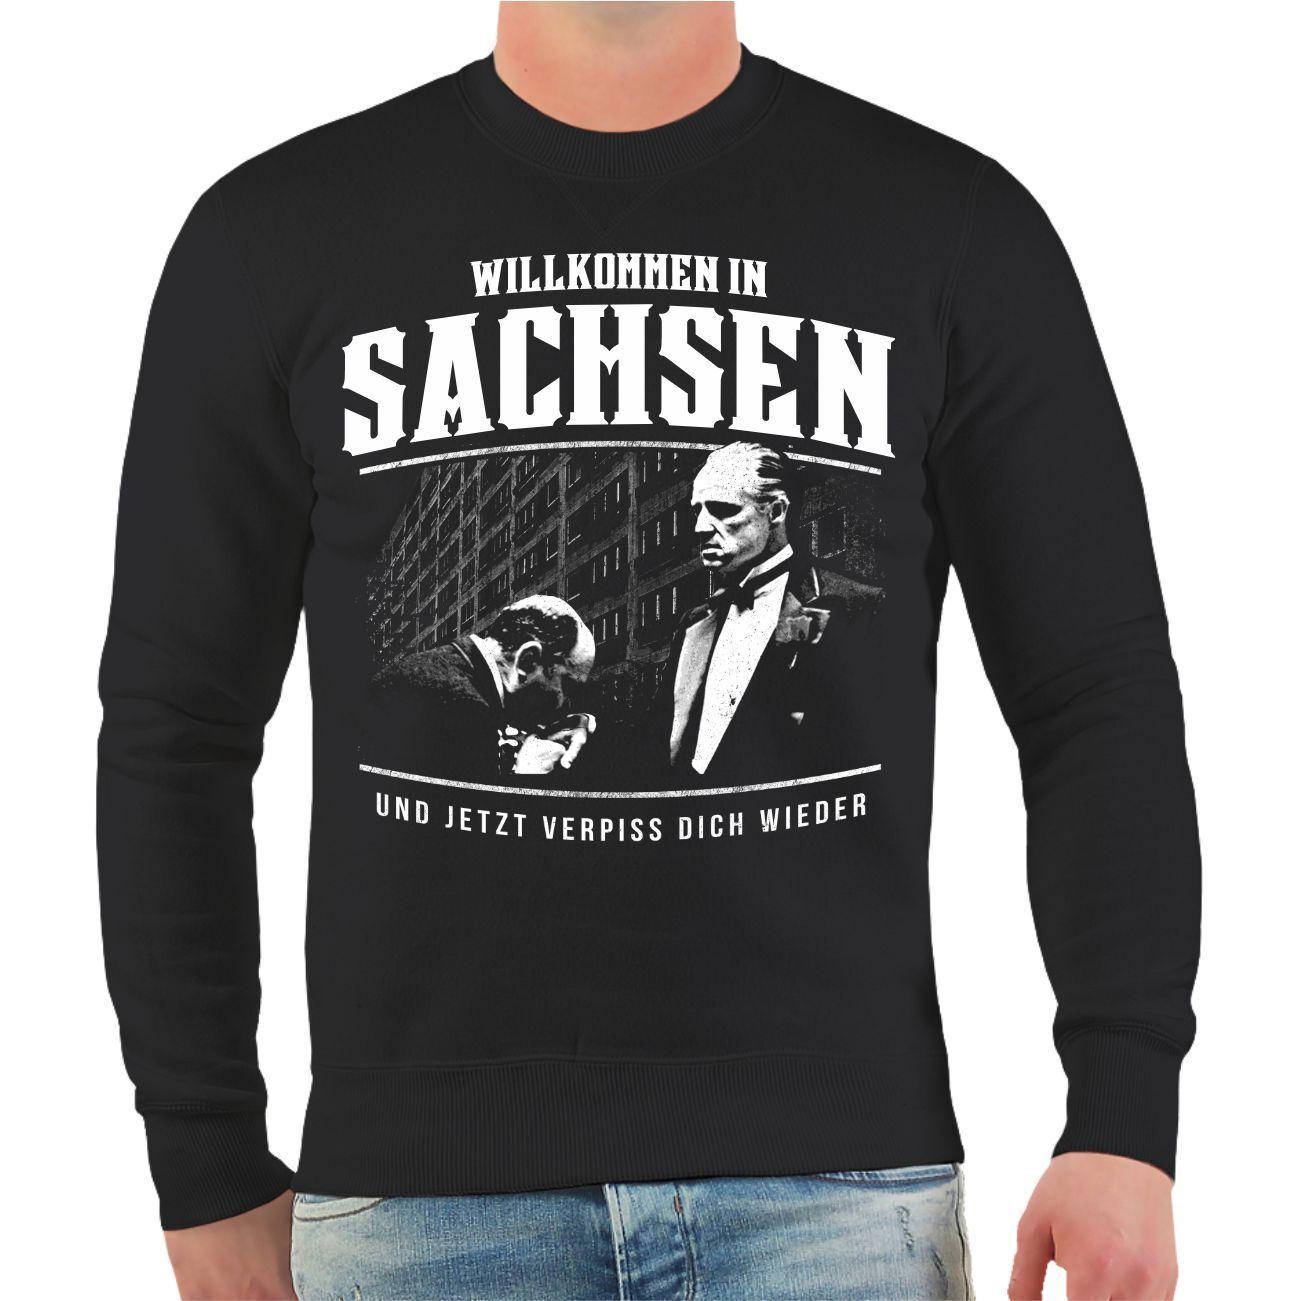 Pullover Pullover Pullover Willkommen in Sachsen Größe S M L XL XXL 3XL 4XL 5XL 6XL 7XL 8XL 10XL | Hochwertige Produkte  75d1ce